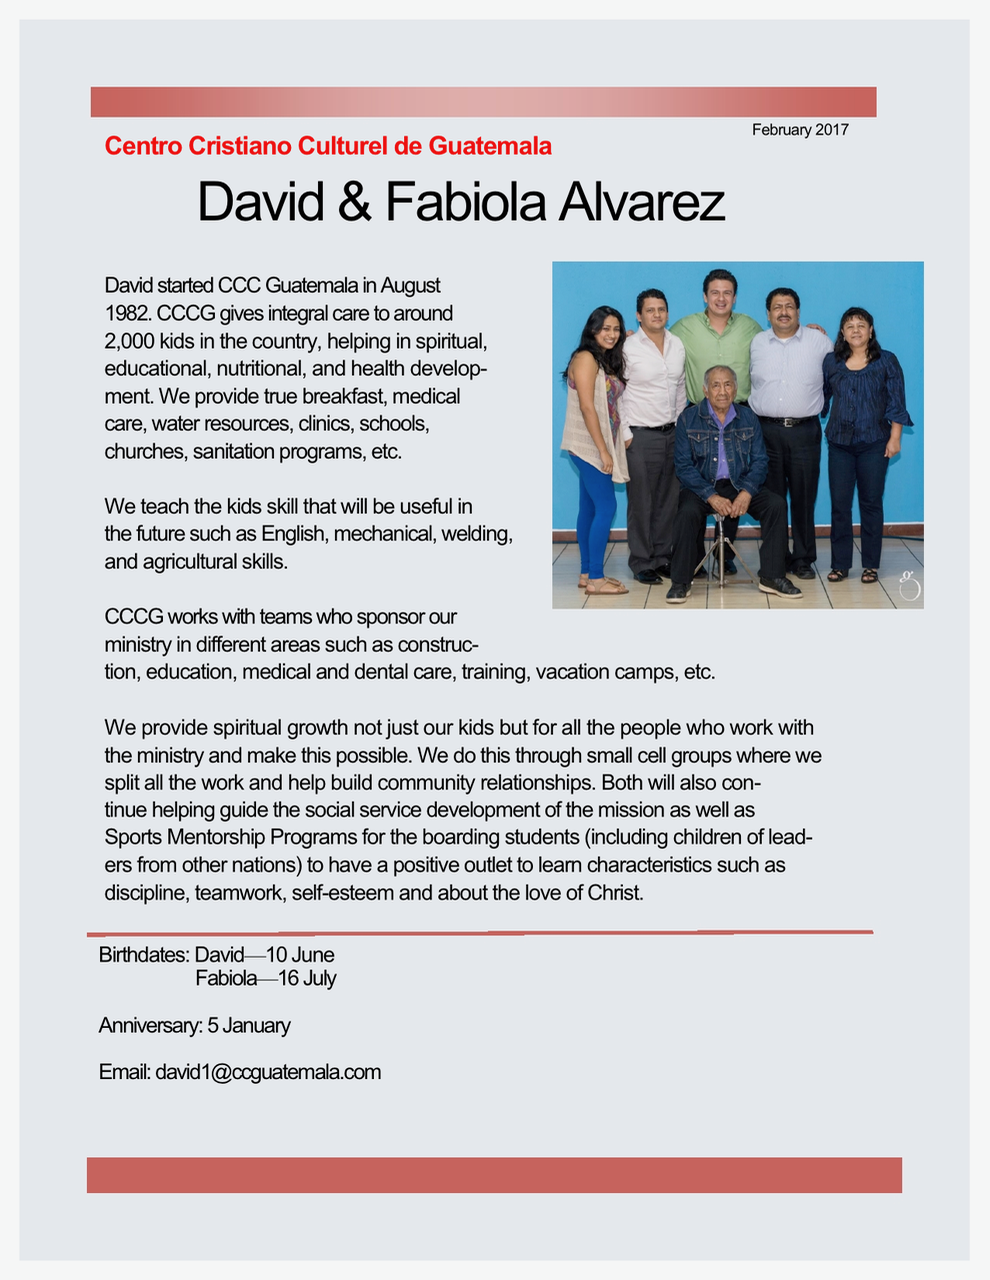 David and Fabiola Alvarez